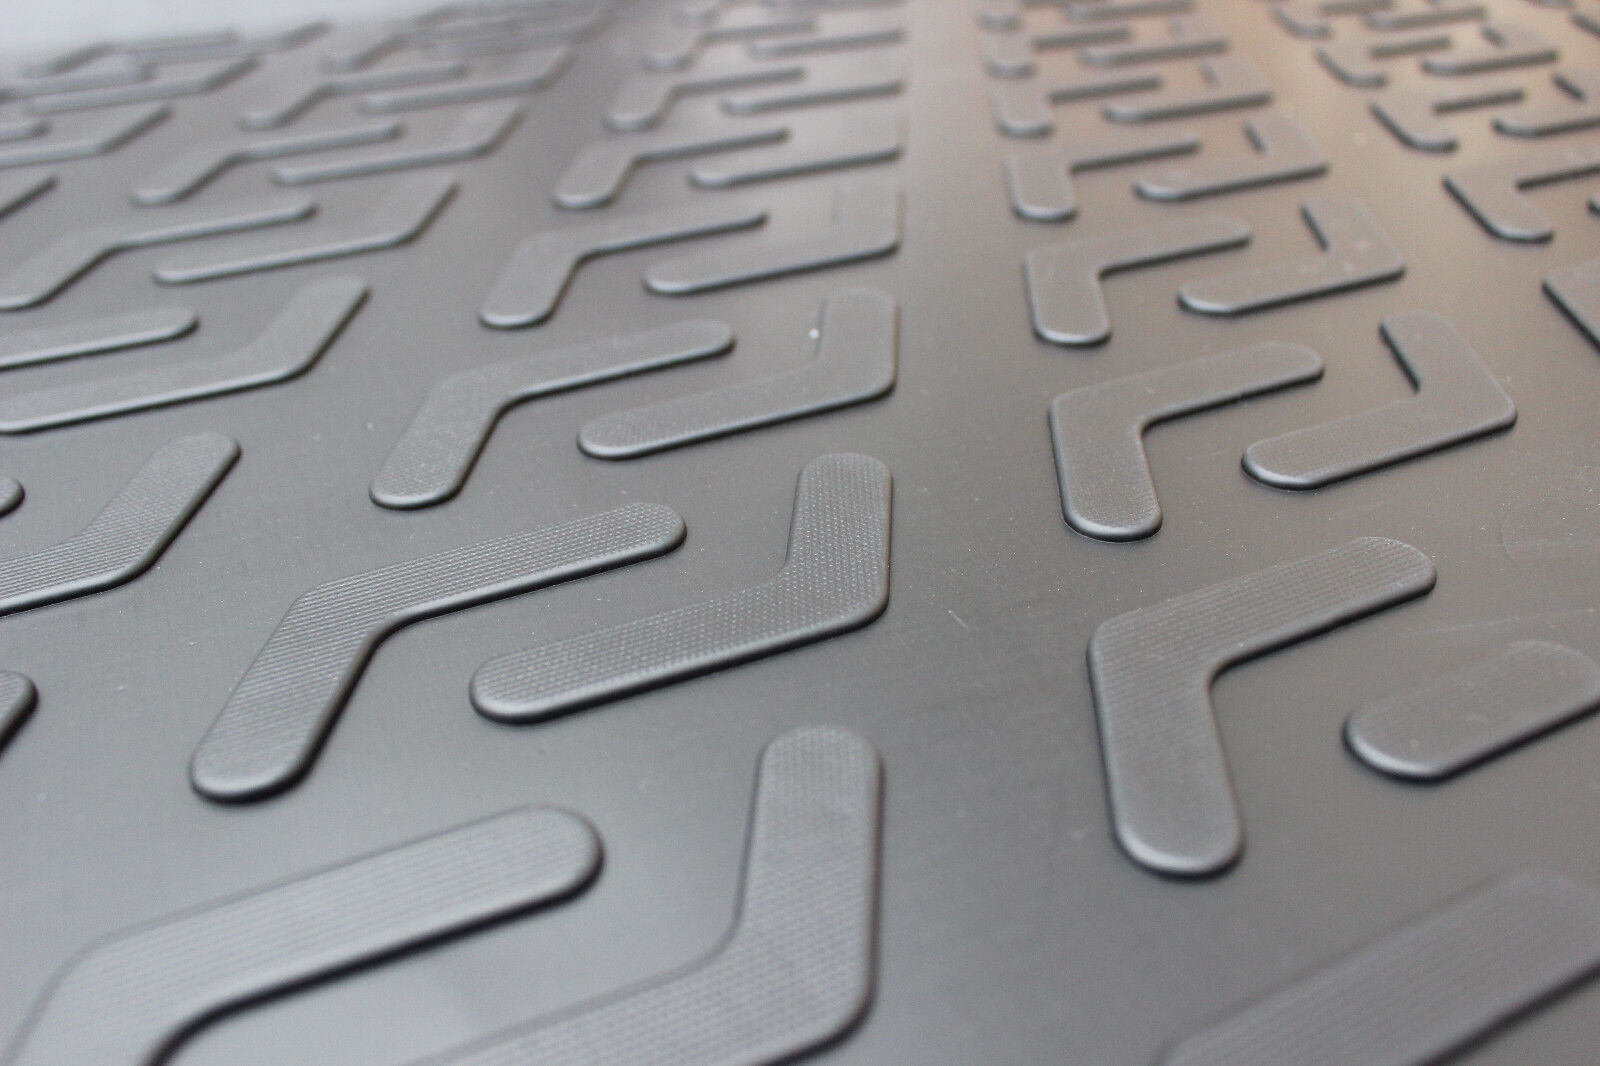 Premium Rubber Boot Liner Mat Tray Protector Citroen C4